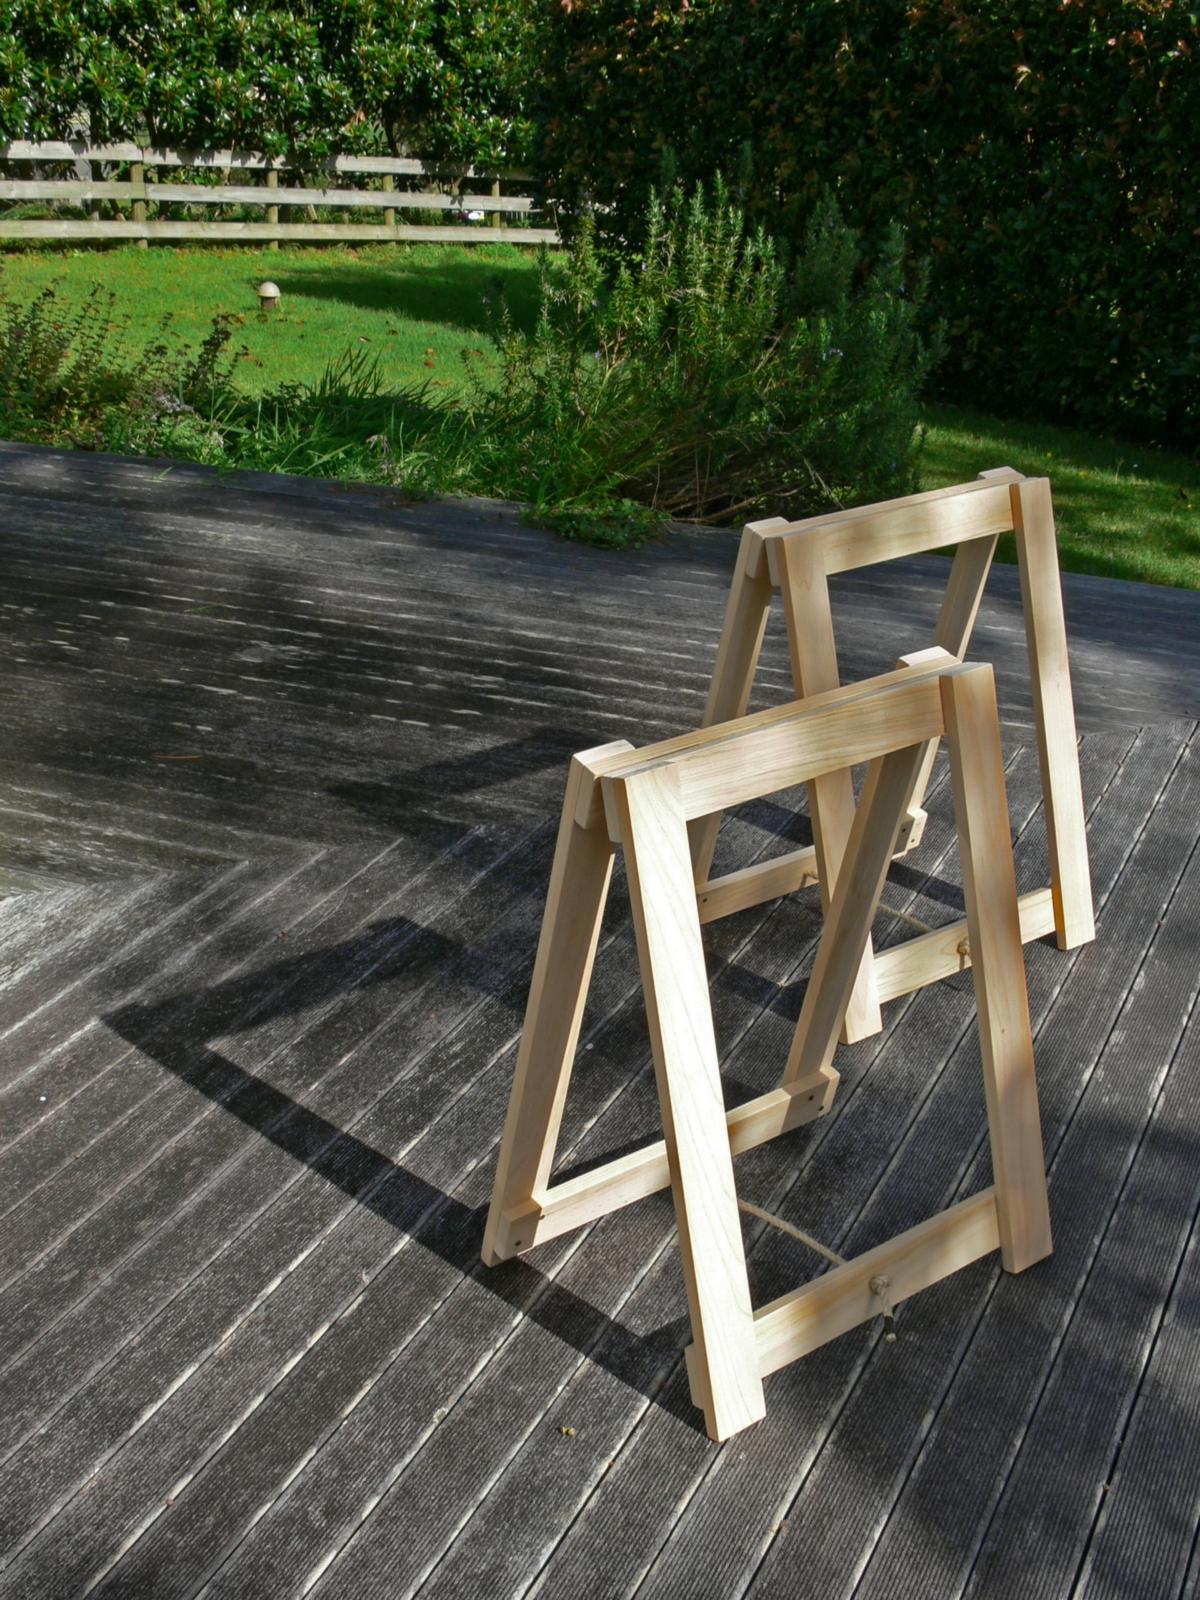 Awesome Trestle Table Legs Stevieawardsjapan